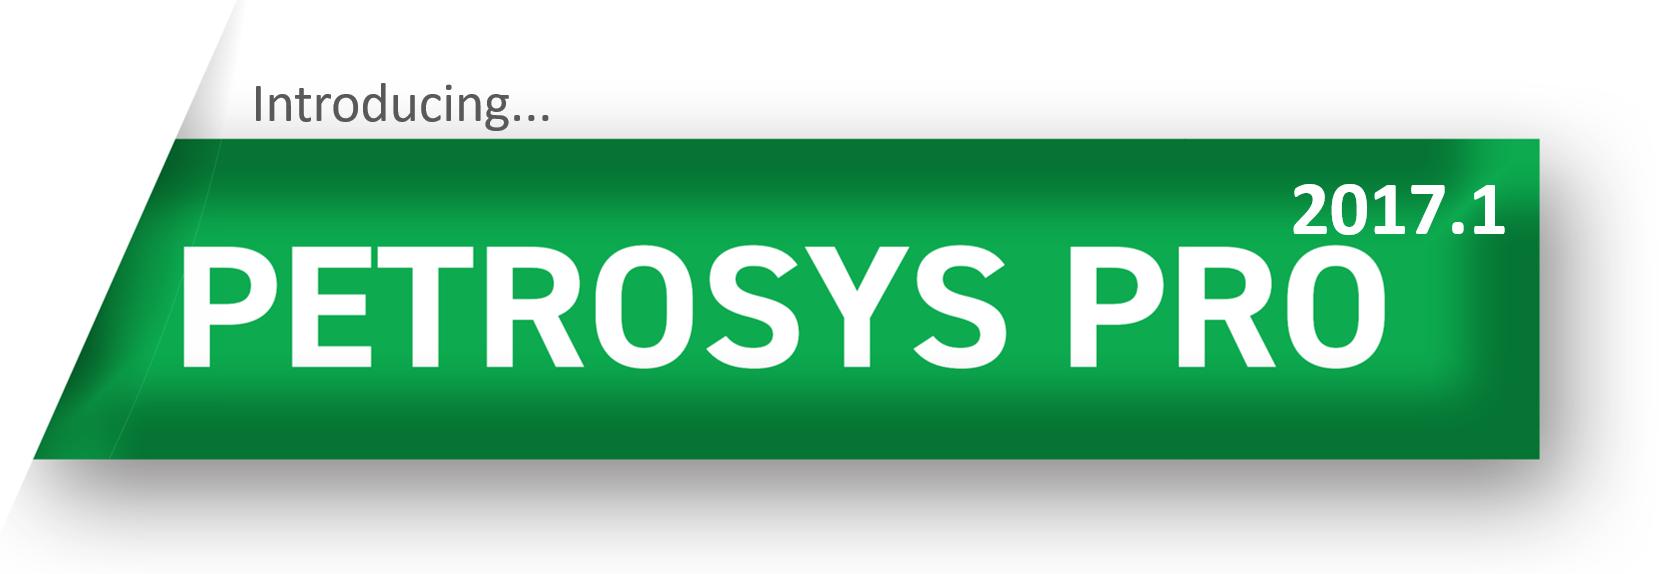 Petrosys PRO 2017.1 - Launching September 2017